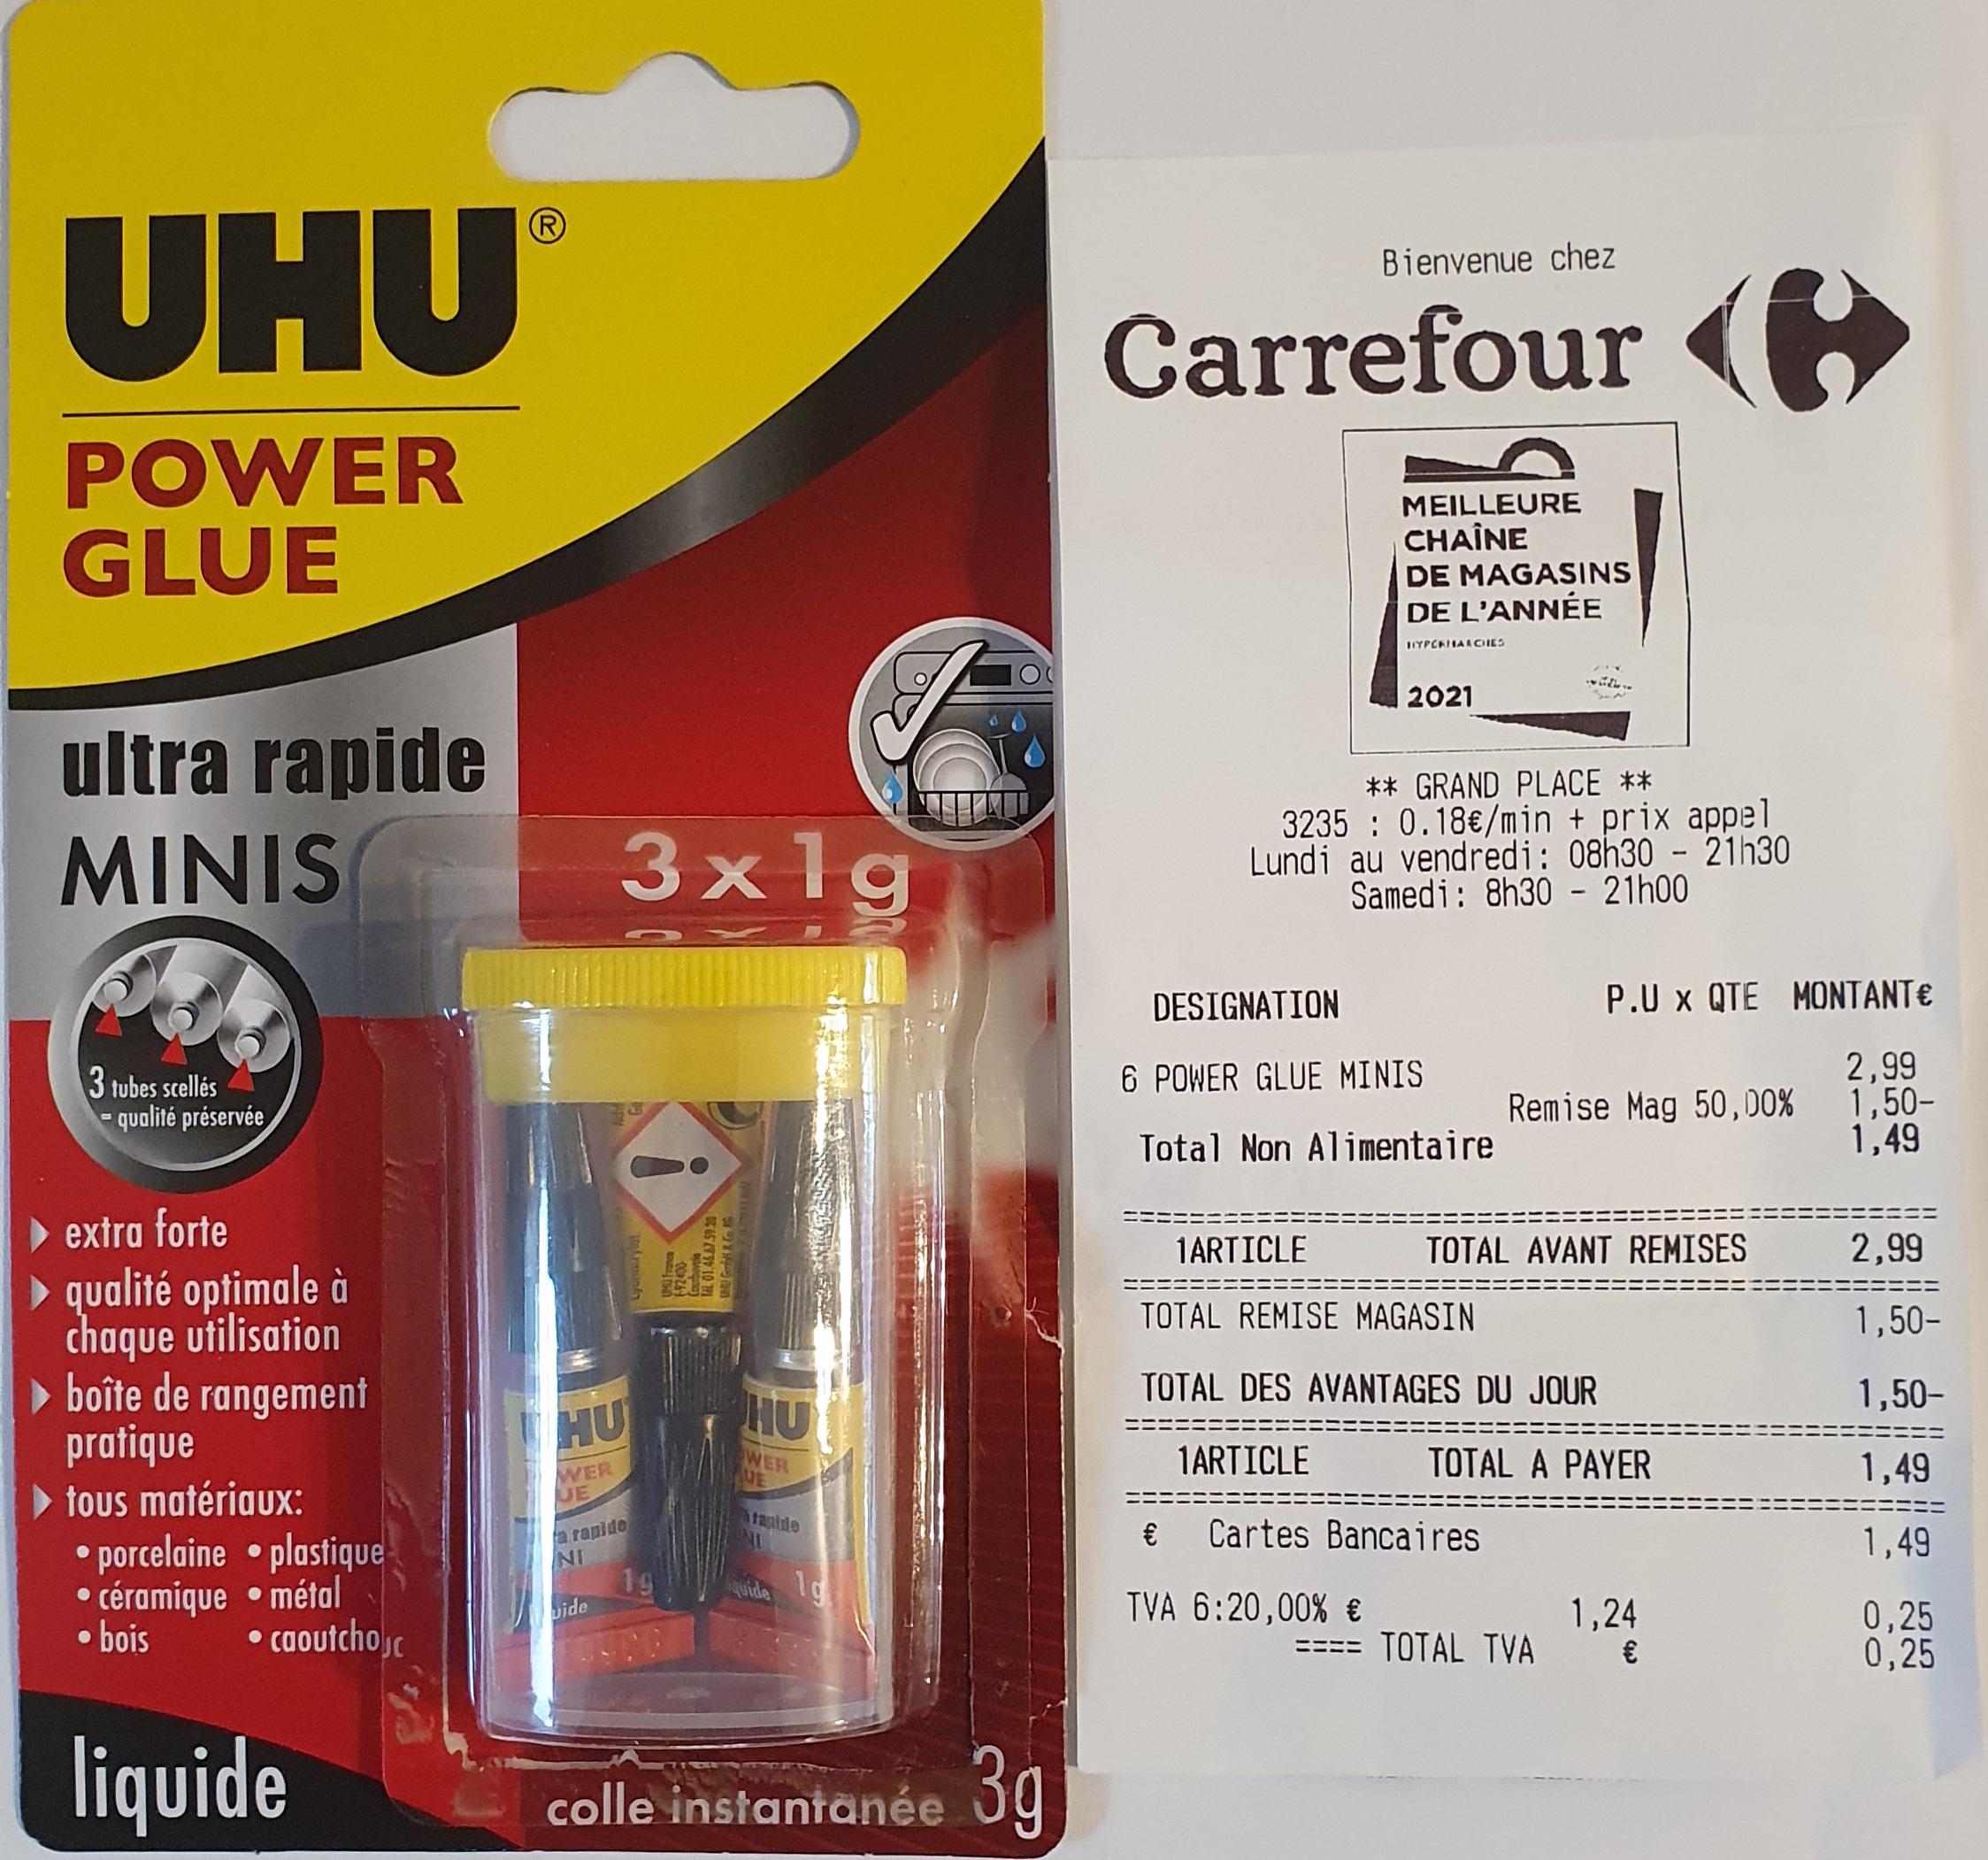 3 tubes de power glue mini UHU (3x1g) - Echirolles (38)